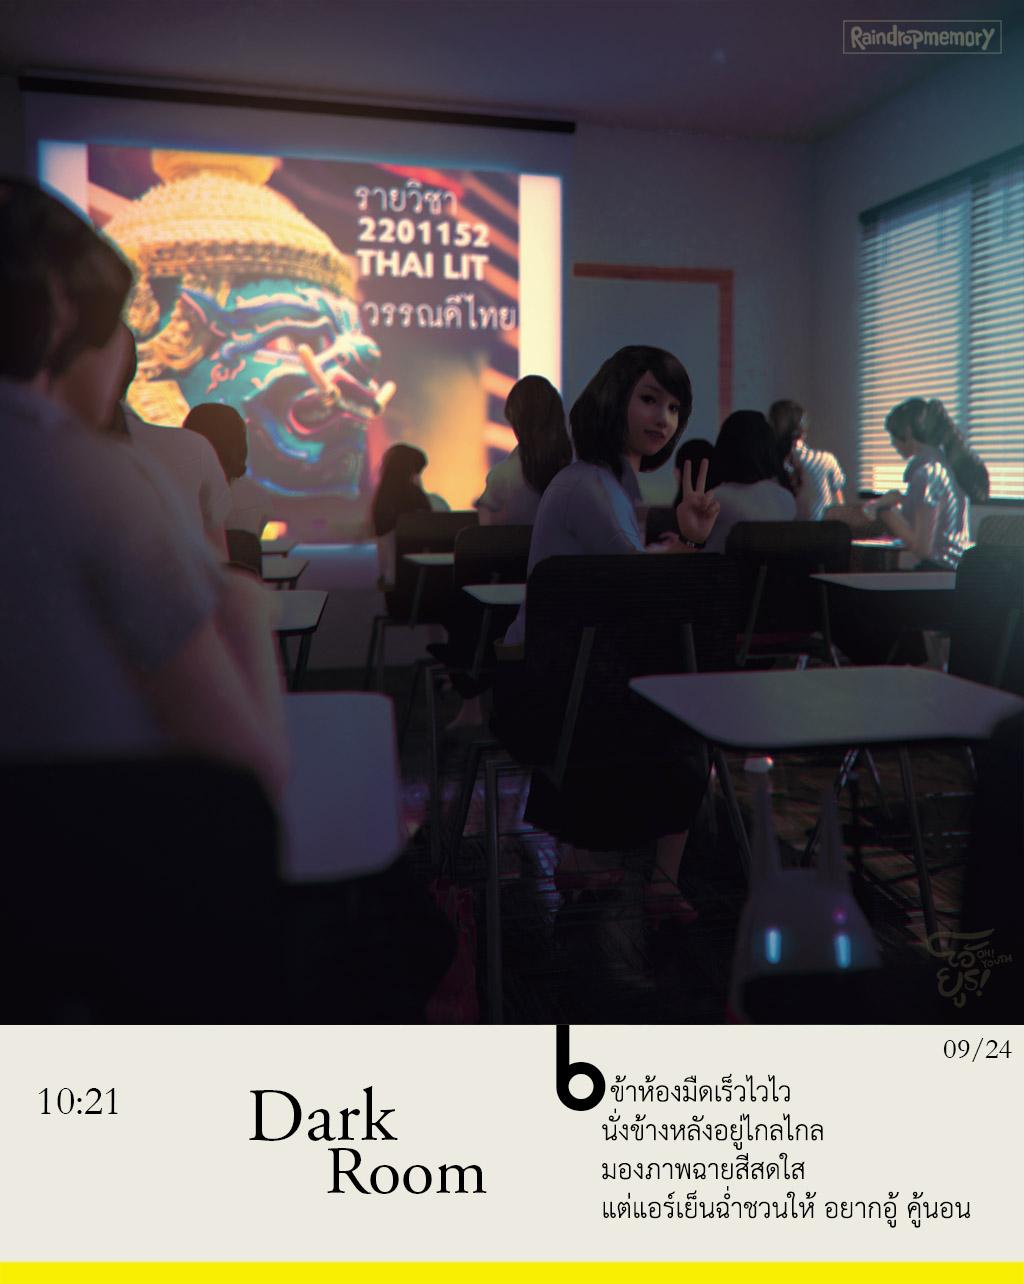 "teekatas :      【☻ Oh! Youth Illustrations Series☻】 09/24: ""Dark Room""    I have to say that this scene inspired by the projection scene in 'Ace Ventura 2' movie. My favorite scene and Very very funny film of Jim Carrey! —->http://www.youtube.com/watch?v=XemkxEUI—A   เข้าห้องมืดเร็วไวไว นั่งข้างหลังอยู่ไกลไกล มองภาพฉายสีสดใส แต่แอร์เย็นฉ่ำชวนให้ อยากอู้ คู้นอน  ป.ล.ภาพนี้ได้แรงบันดาลใจมาจากฉากหนึ่งในหนังเรื่อง Ace Ventura 2 ครับ (ใครเคยดูบ้าง) —>  http://www.youtube.com/watch?v=XemkxEUI—A  เป็นหนังที่ป่วงมาาาก"